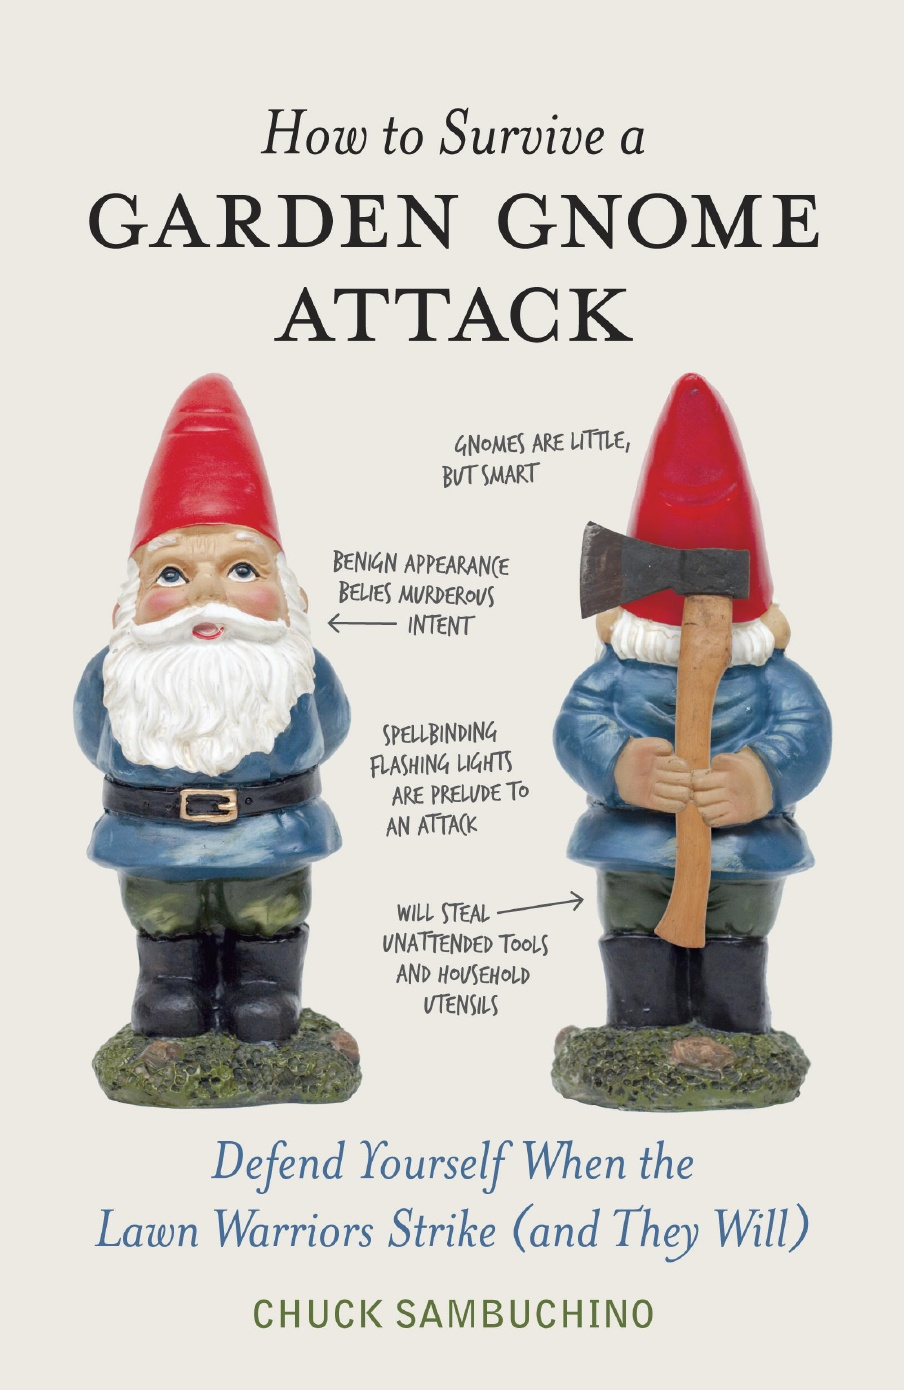 """How to Survive a Garden Gnome Attack"" by Chuck Sambuchino."